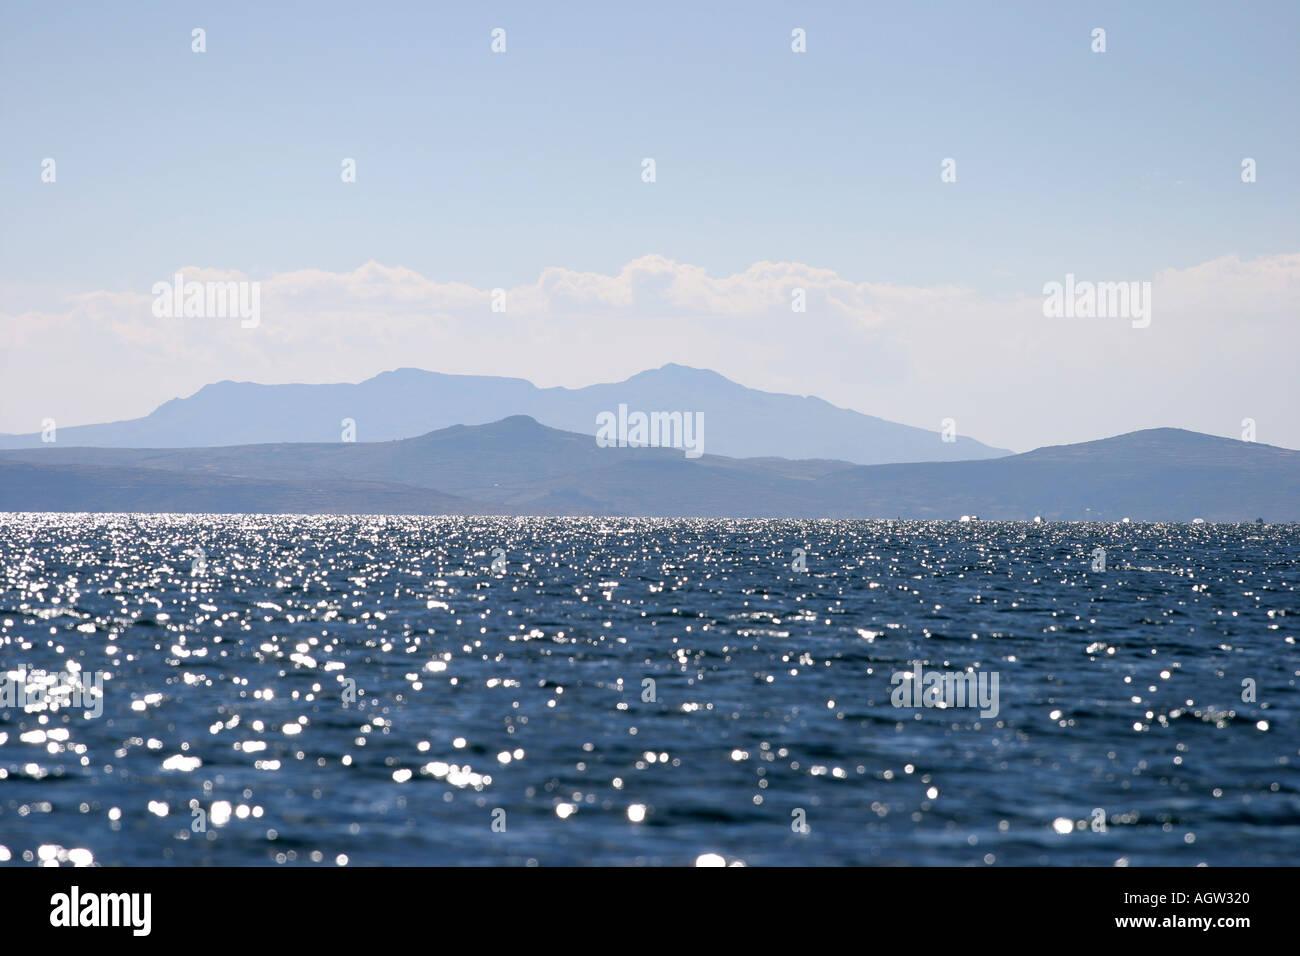 Lake Titicaca on the Peru side - Stock Image